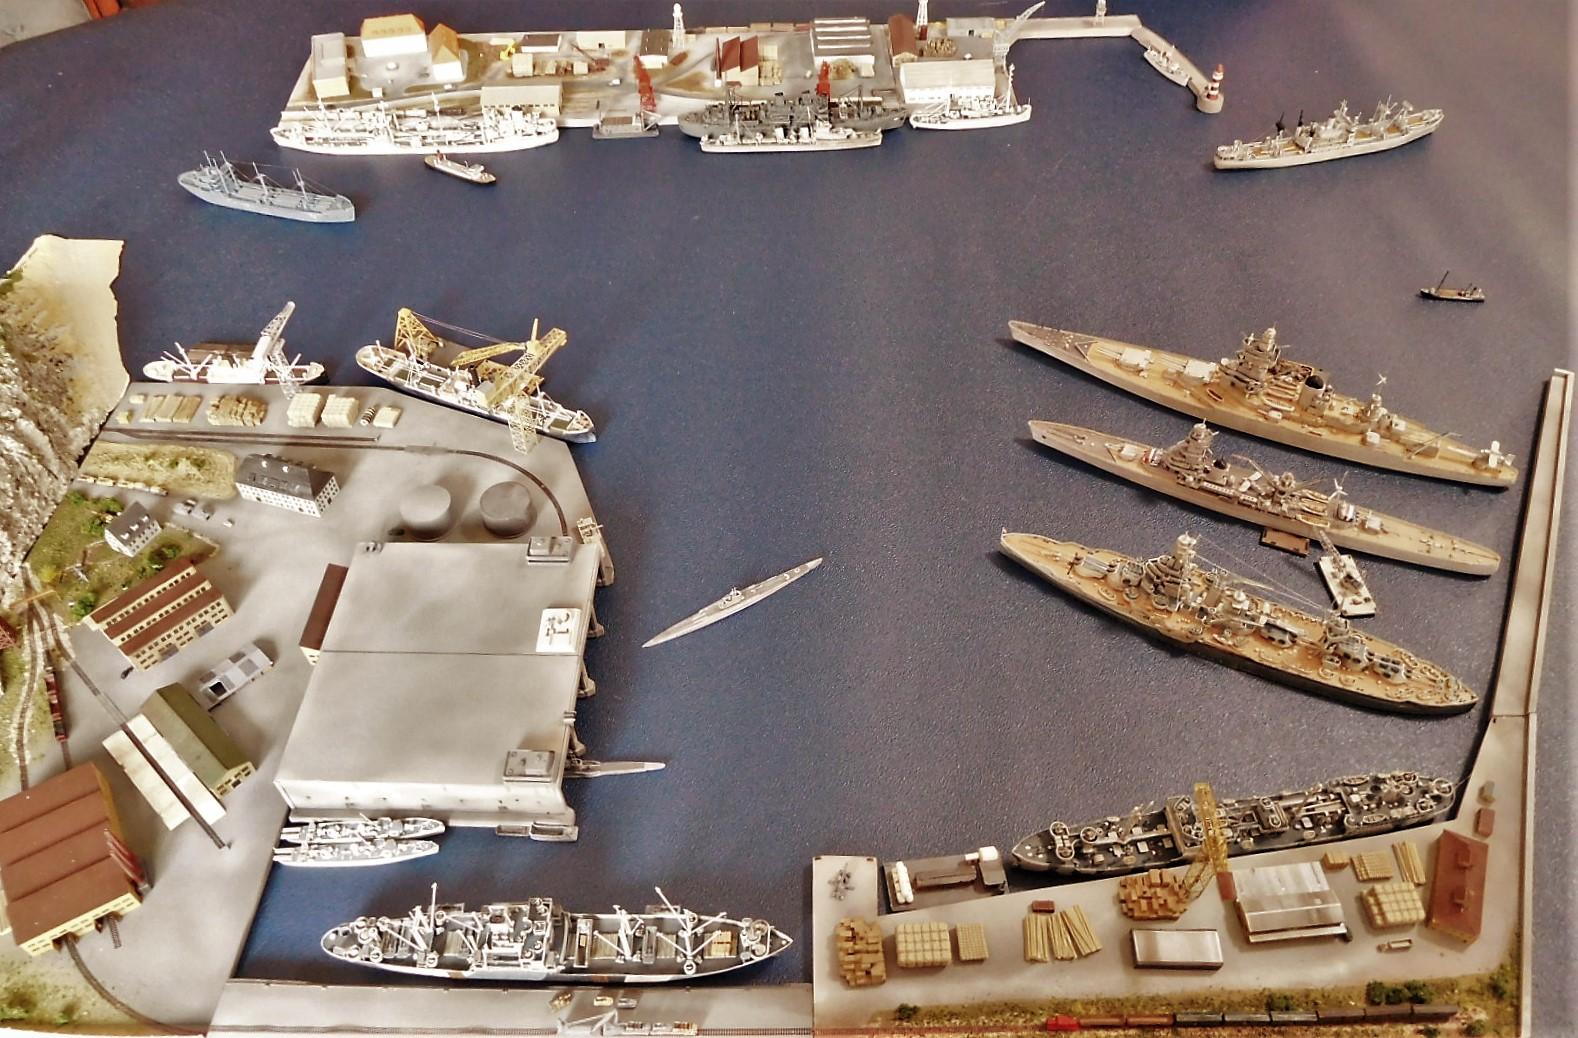 Diorama base navale 1/700 par Nesquik - Page 4 CJAC41ivV